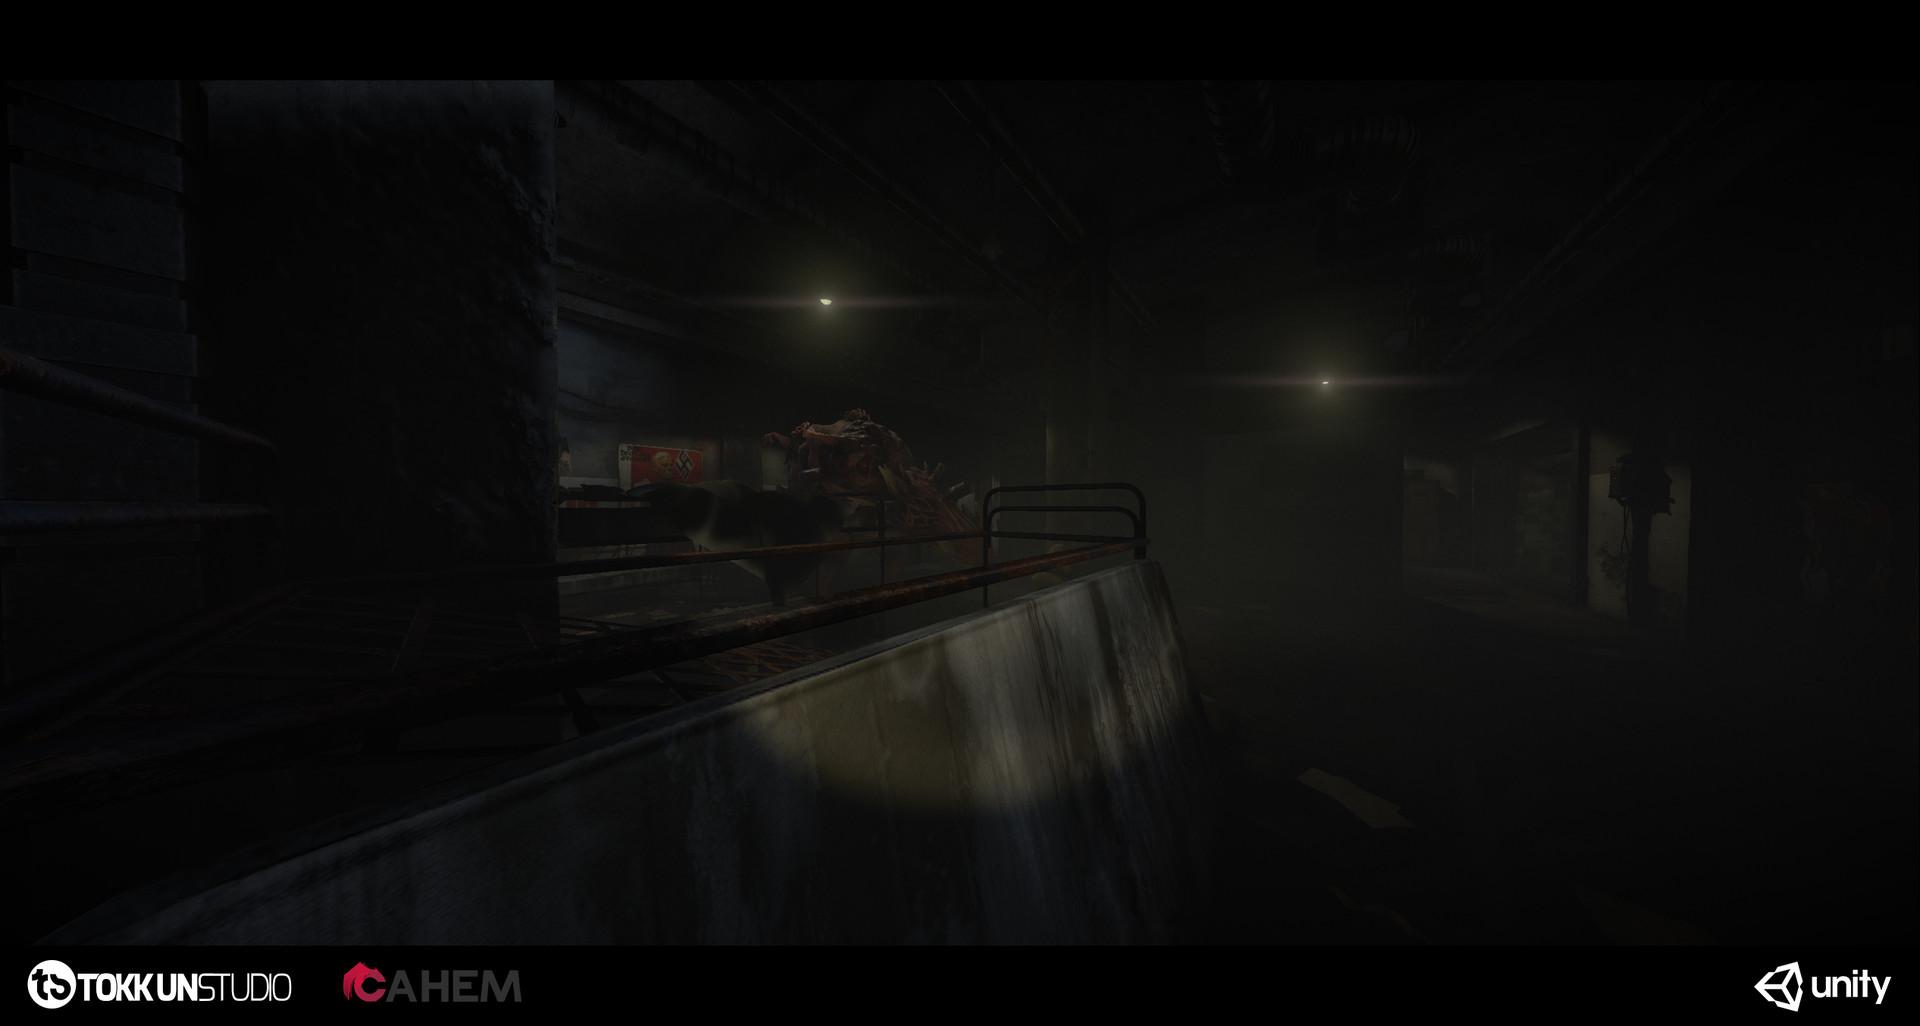 Tokkun studio bunker shot 11